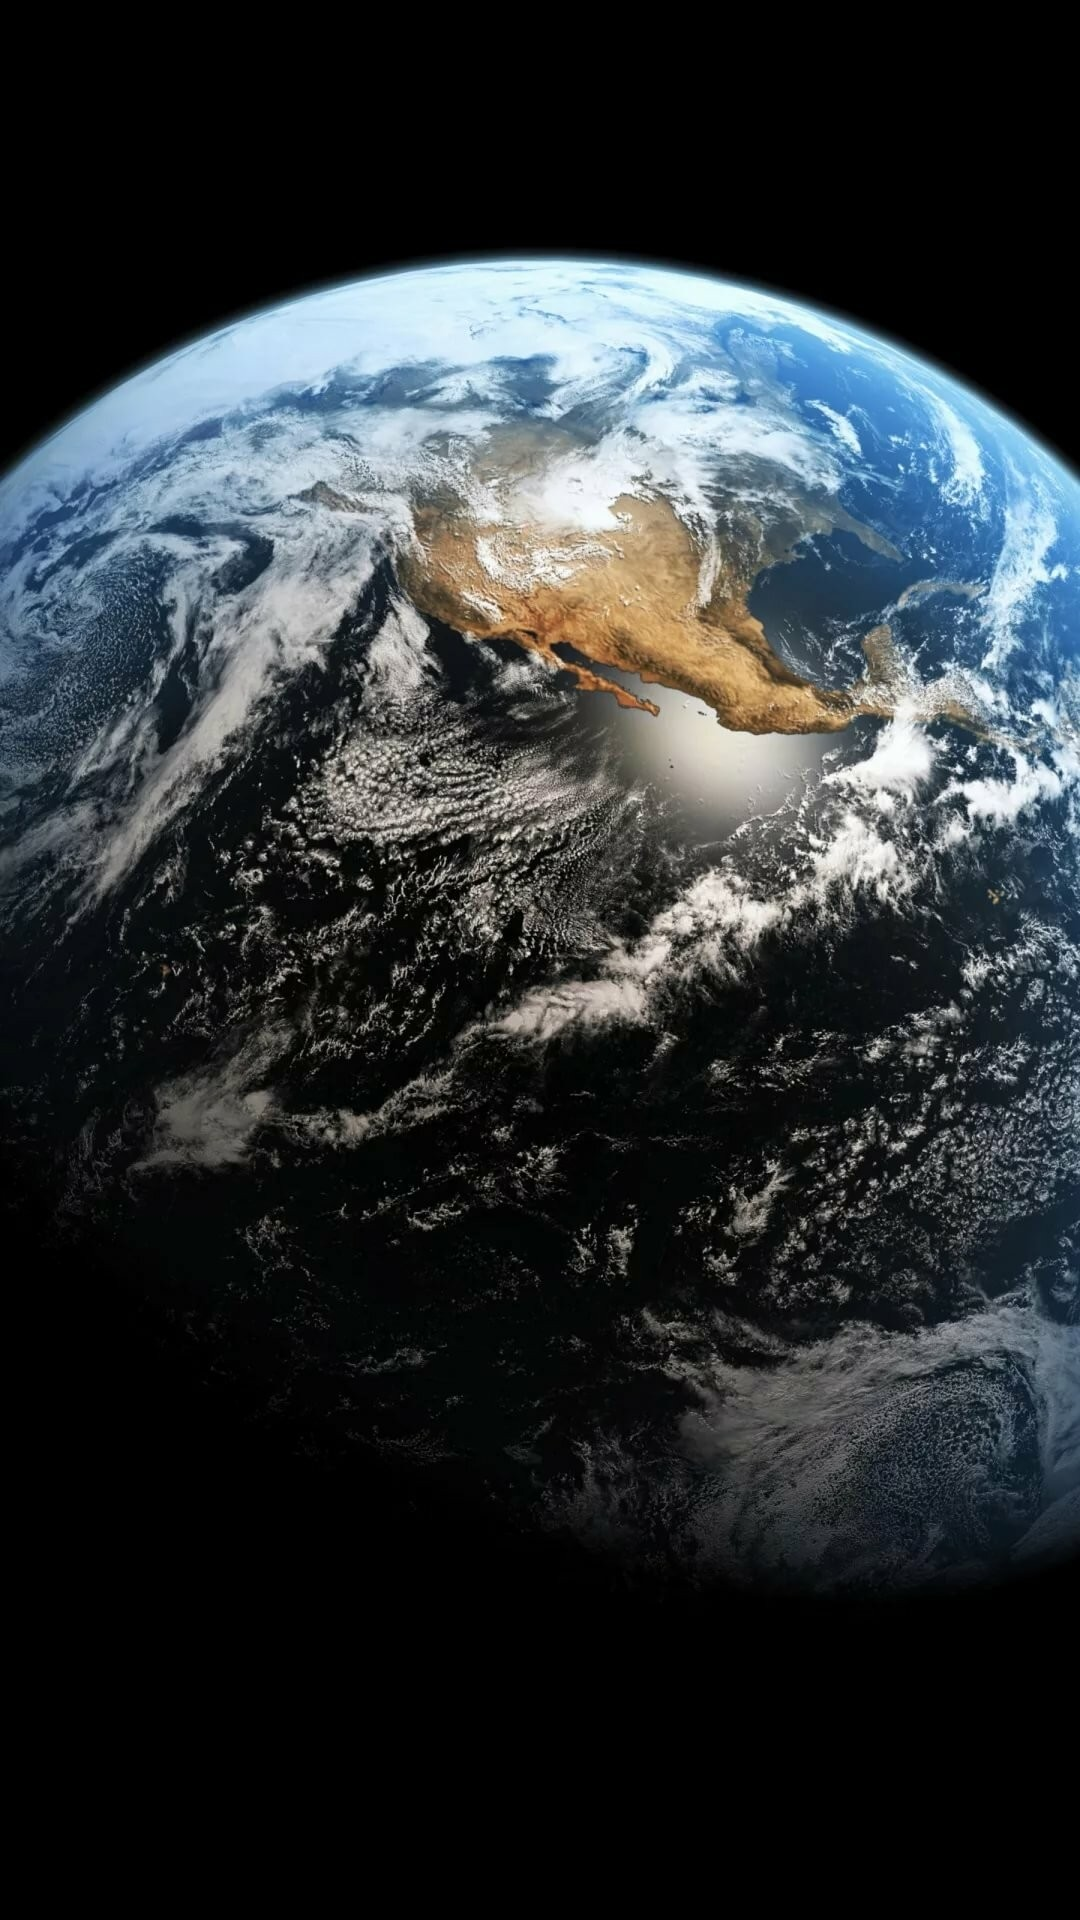 Earth hd wallpaper for mobile